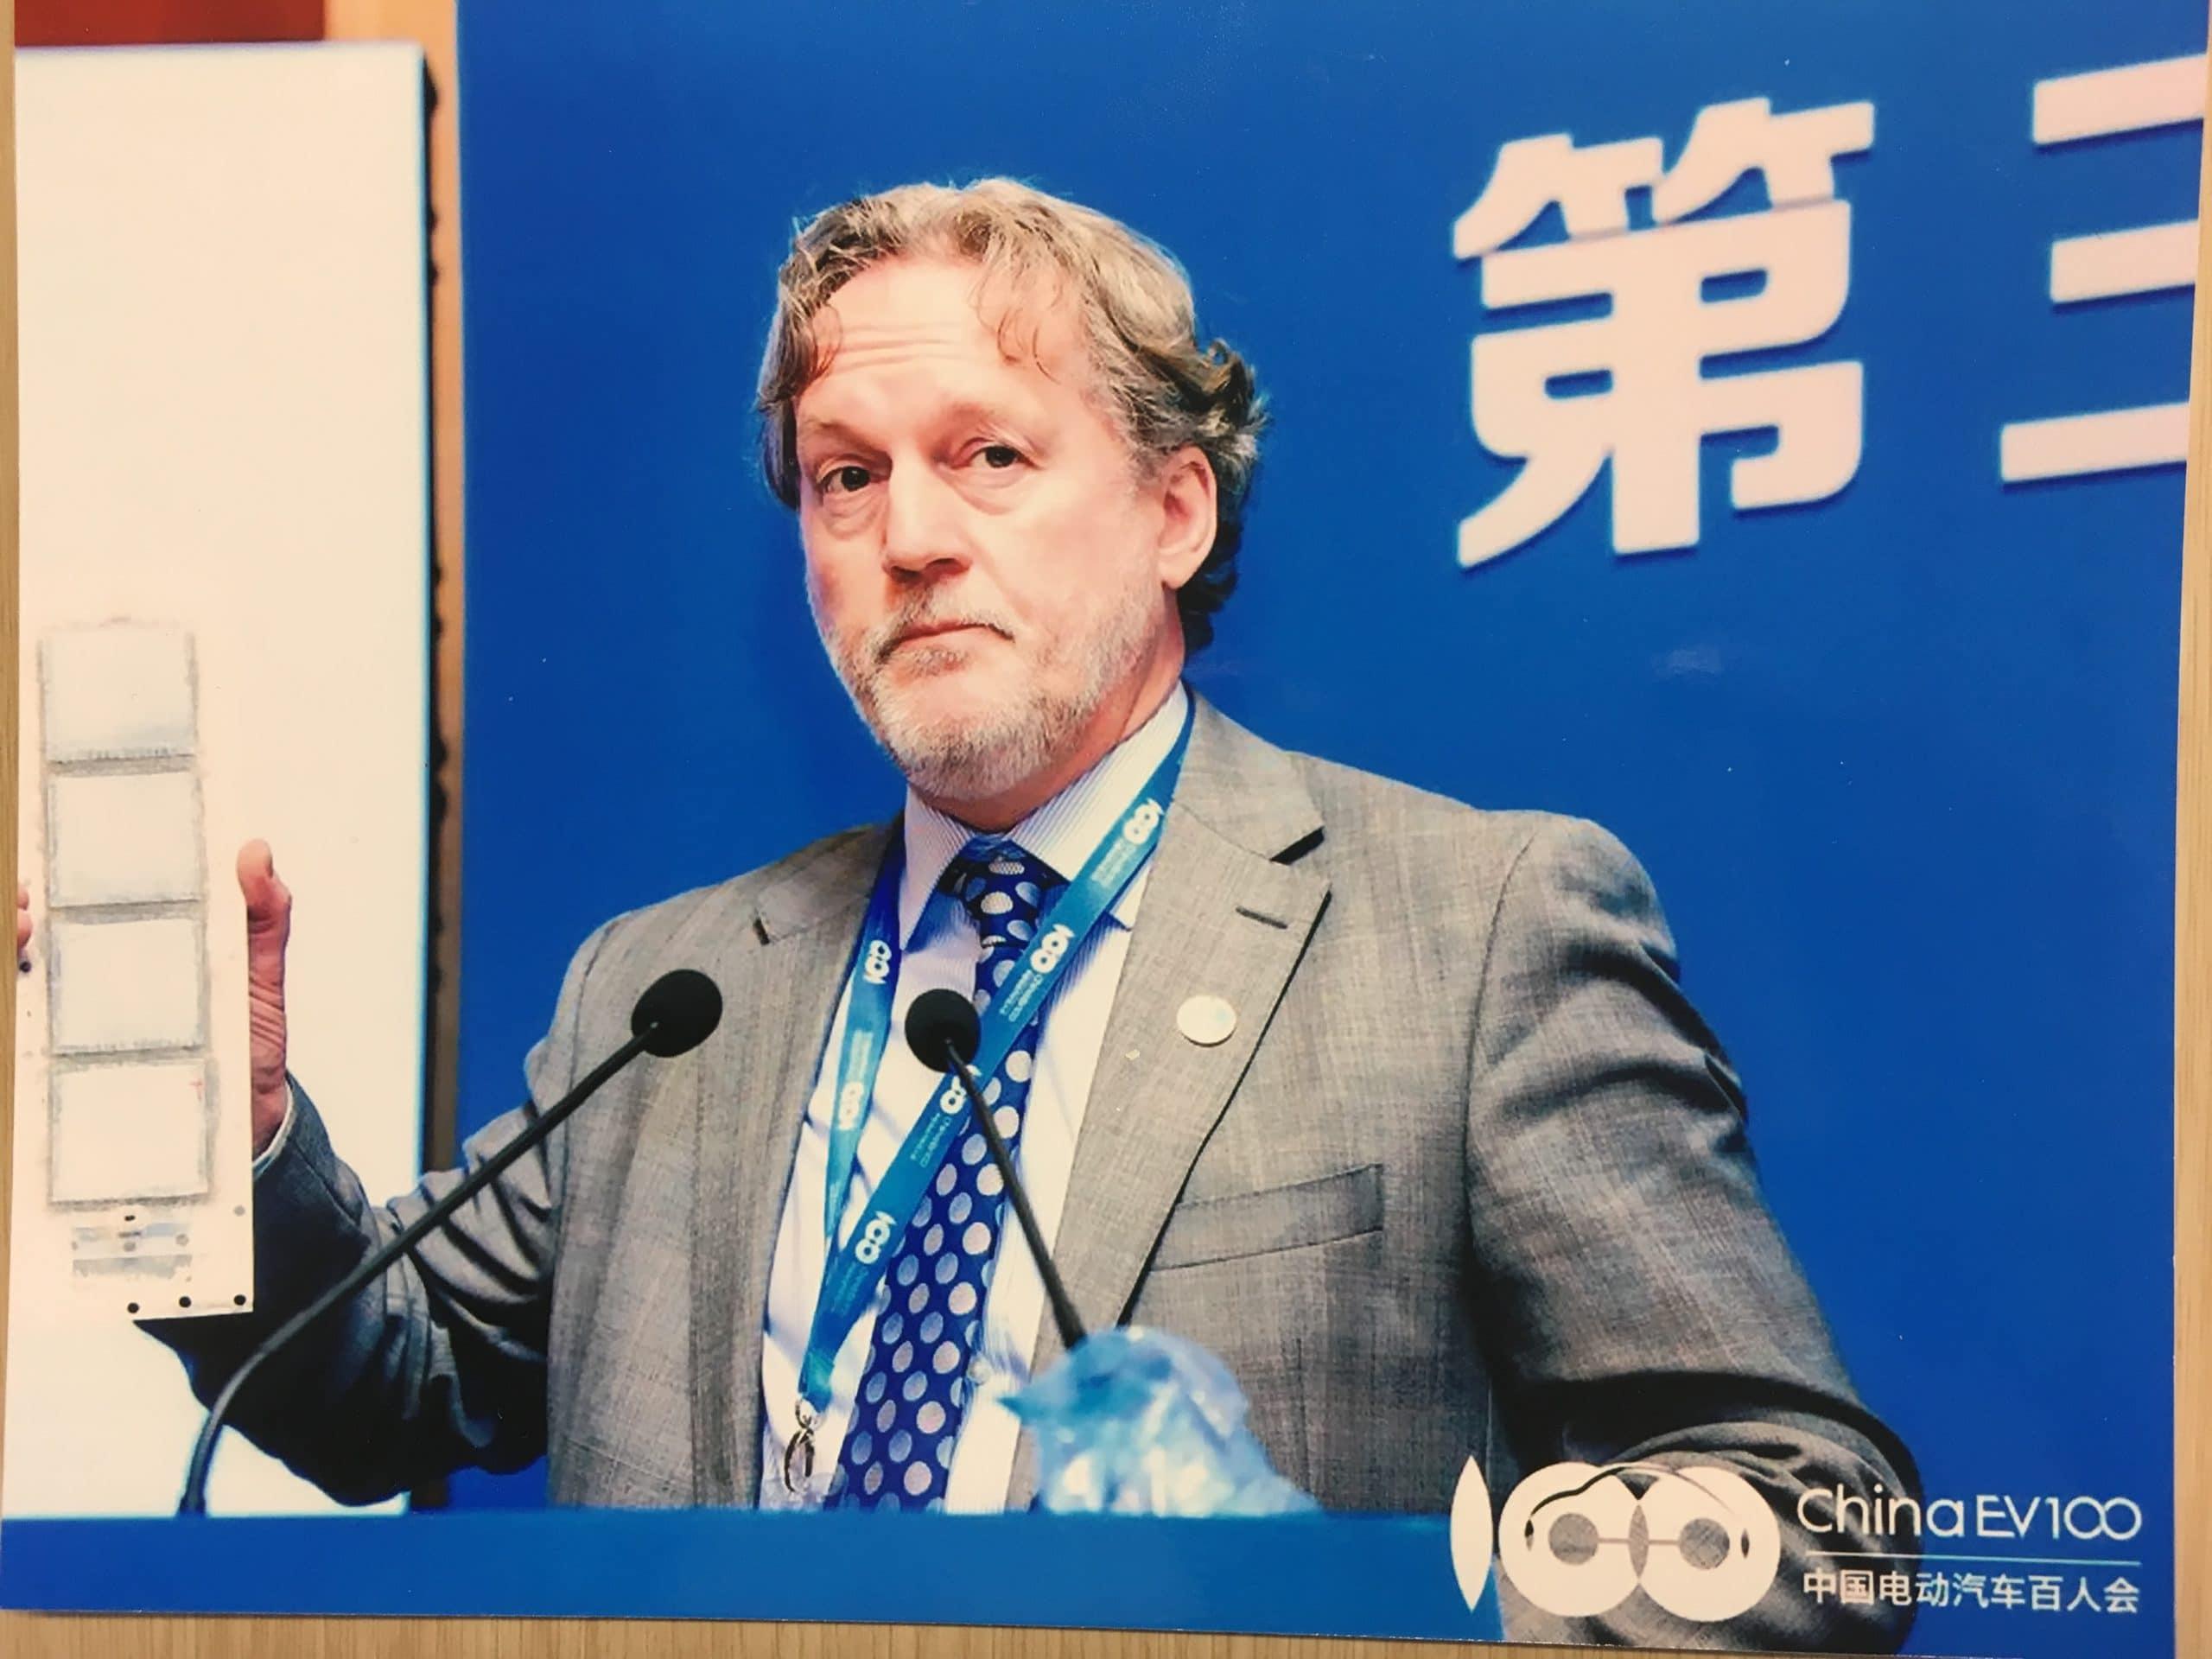 Trevor presenting at the China 100 EV Conference, Beijing 2019